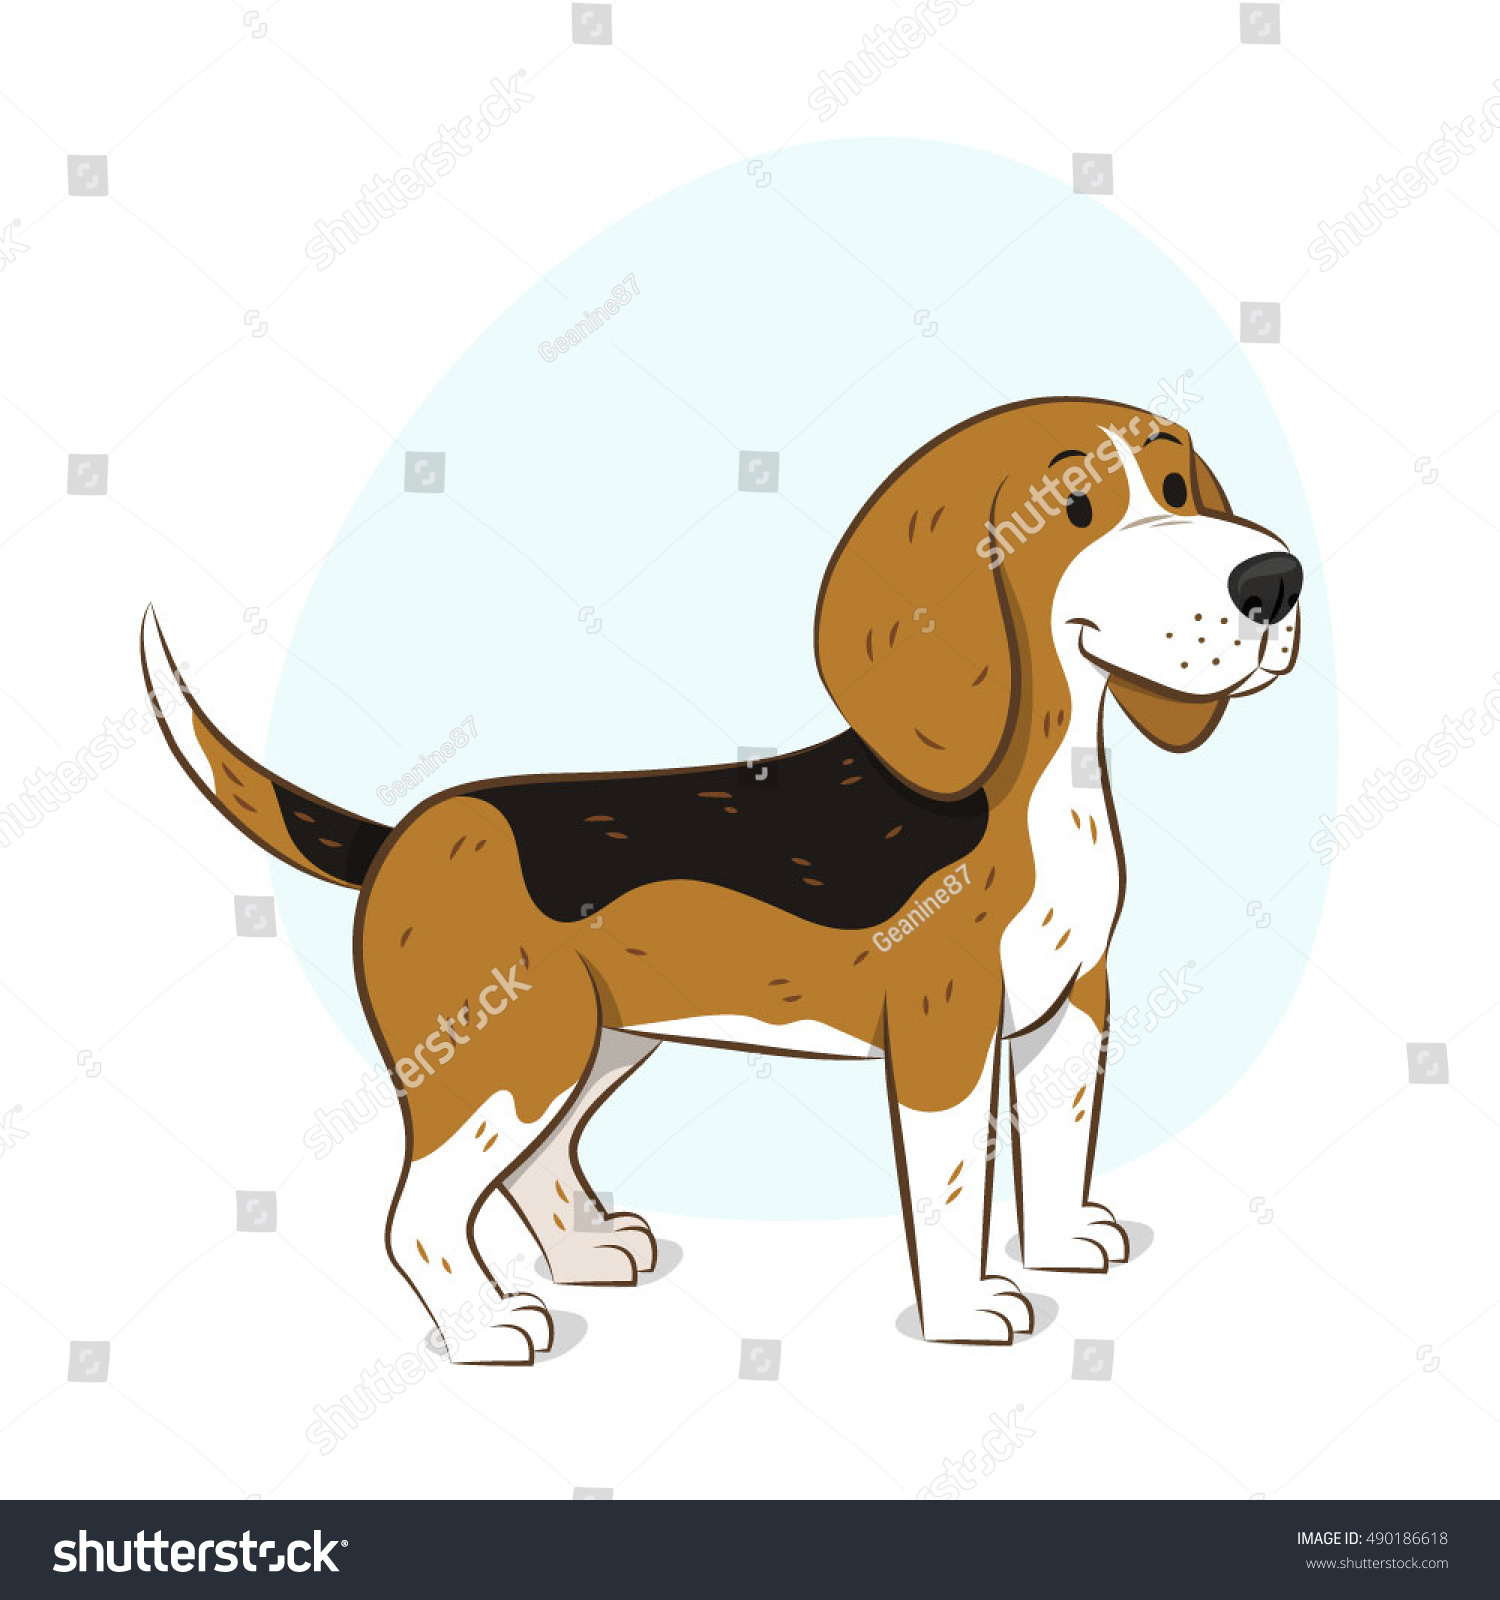 Encantador Beagle Para Colorear Imprimible Ilustración - Dibujos ...